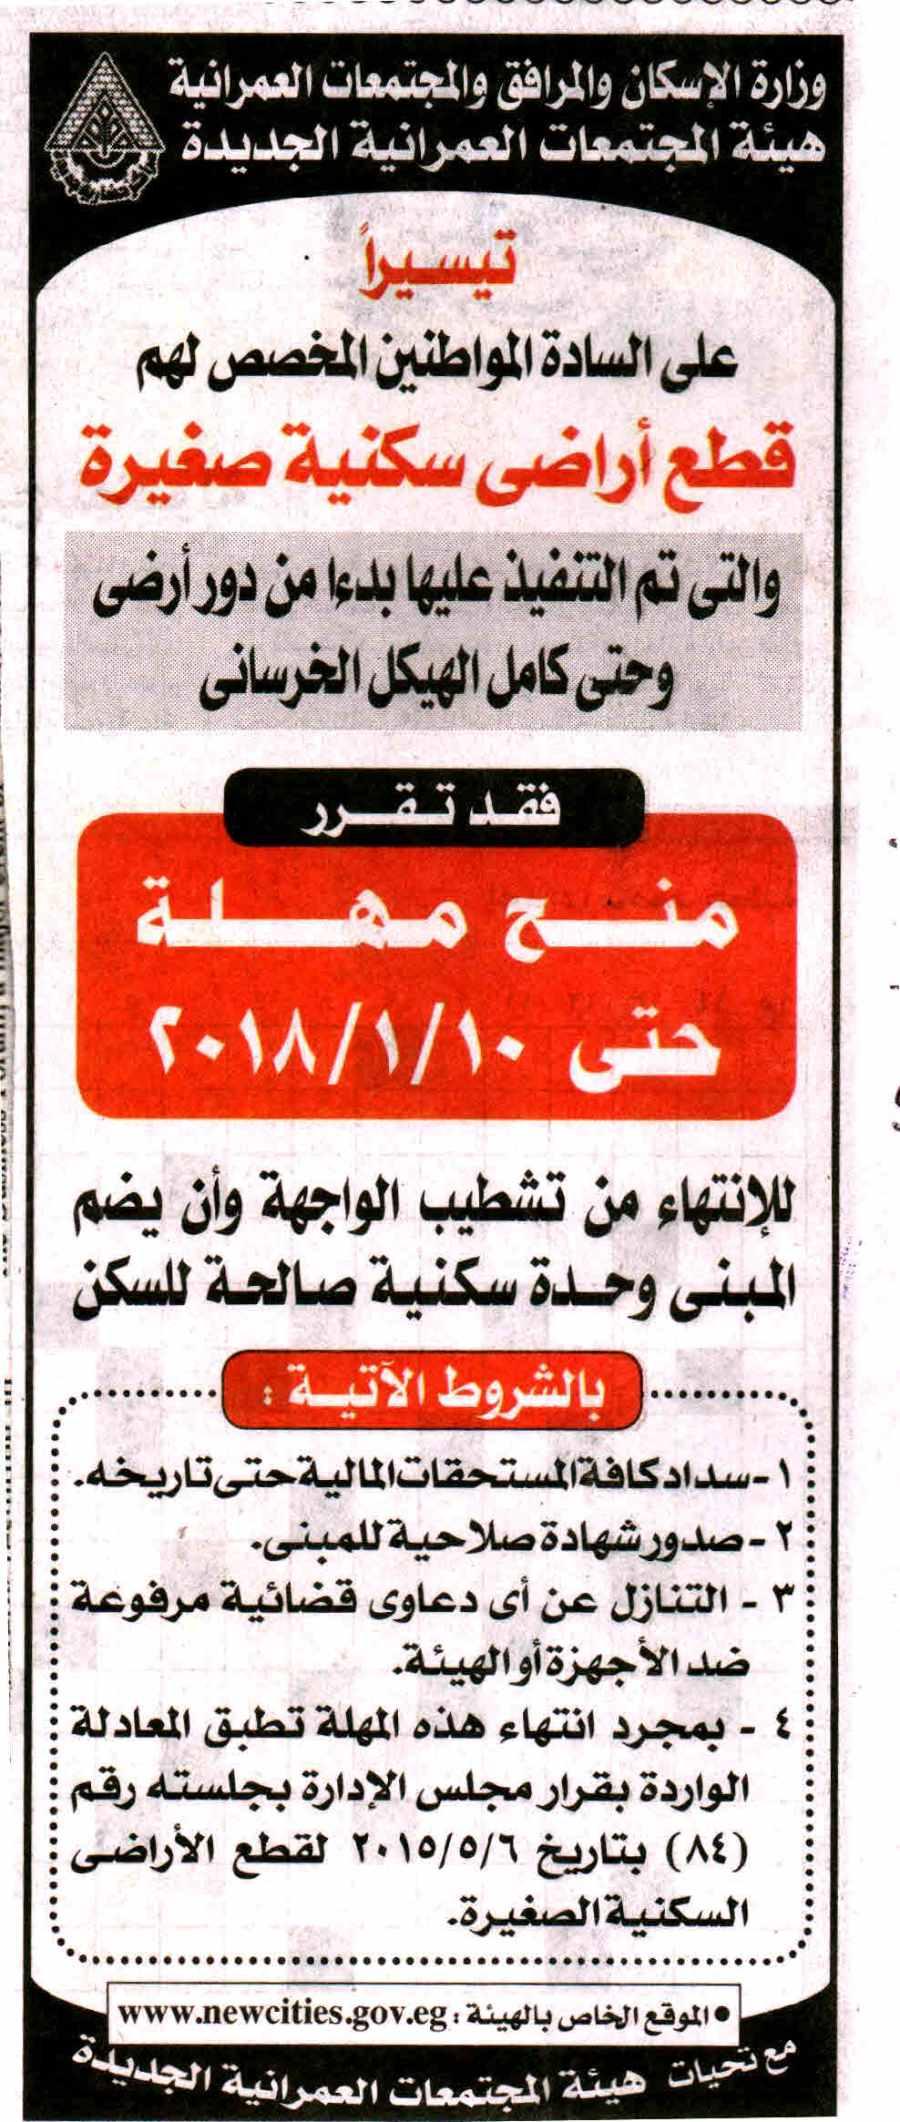 Al Ahram 5 Sep P.1.jpg